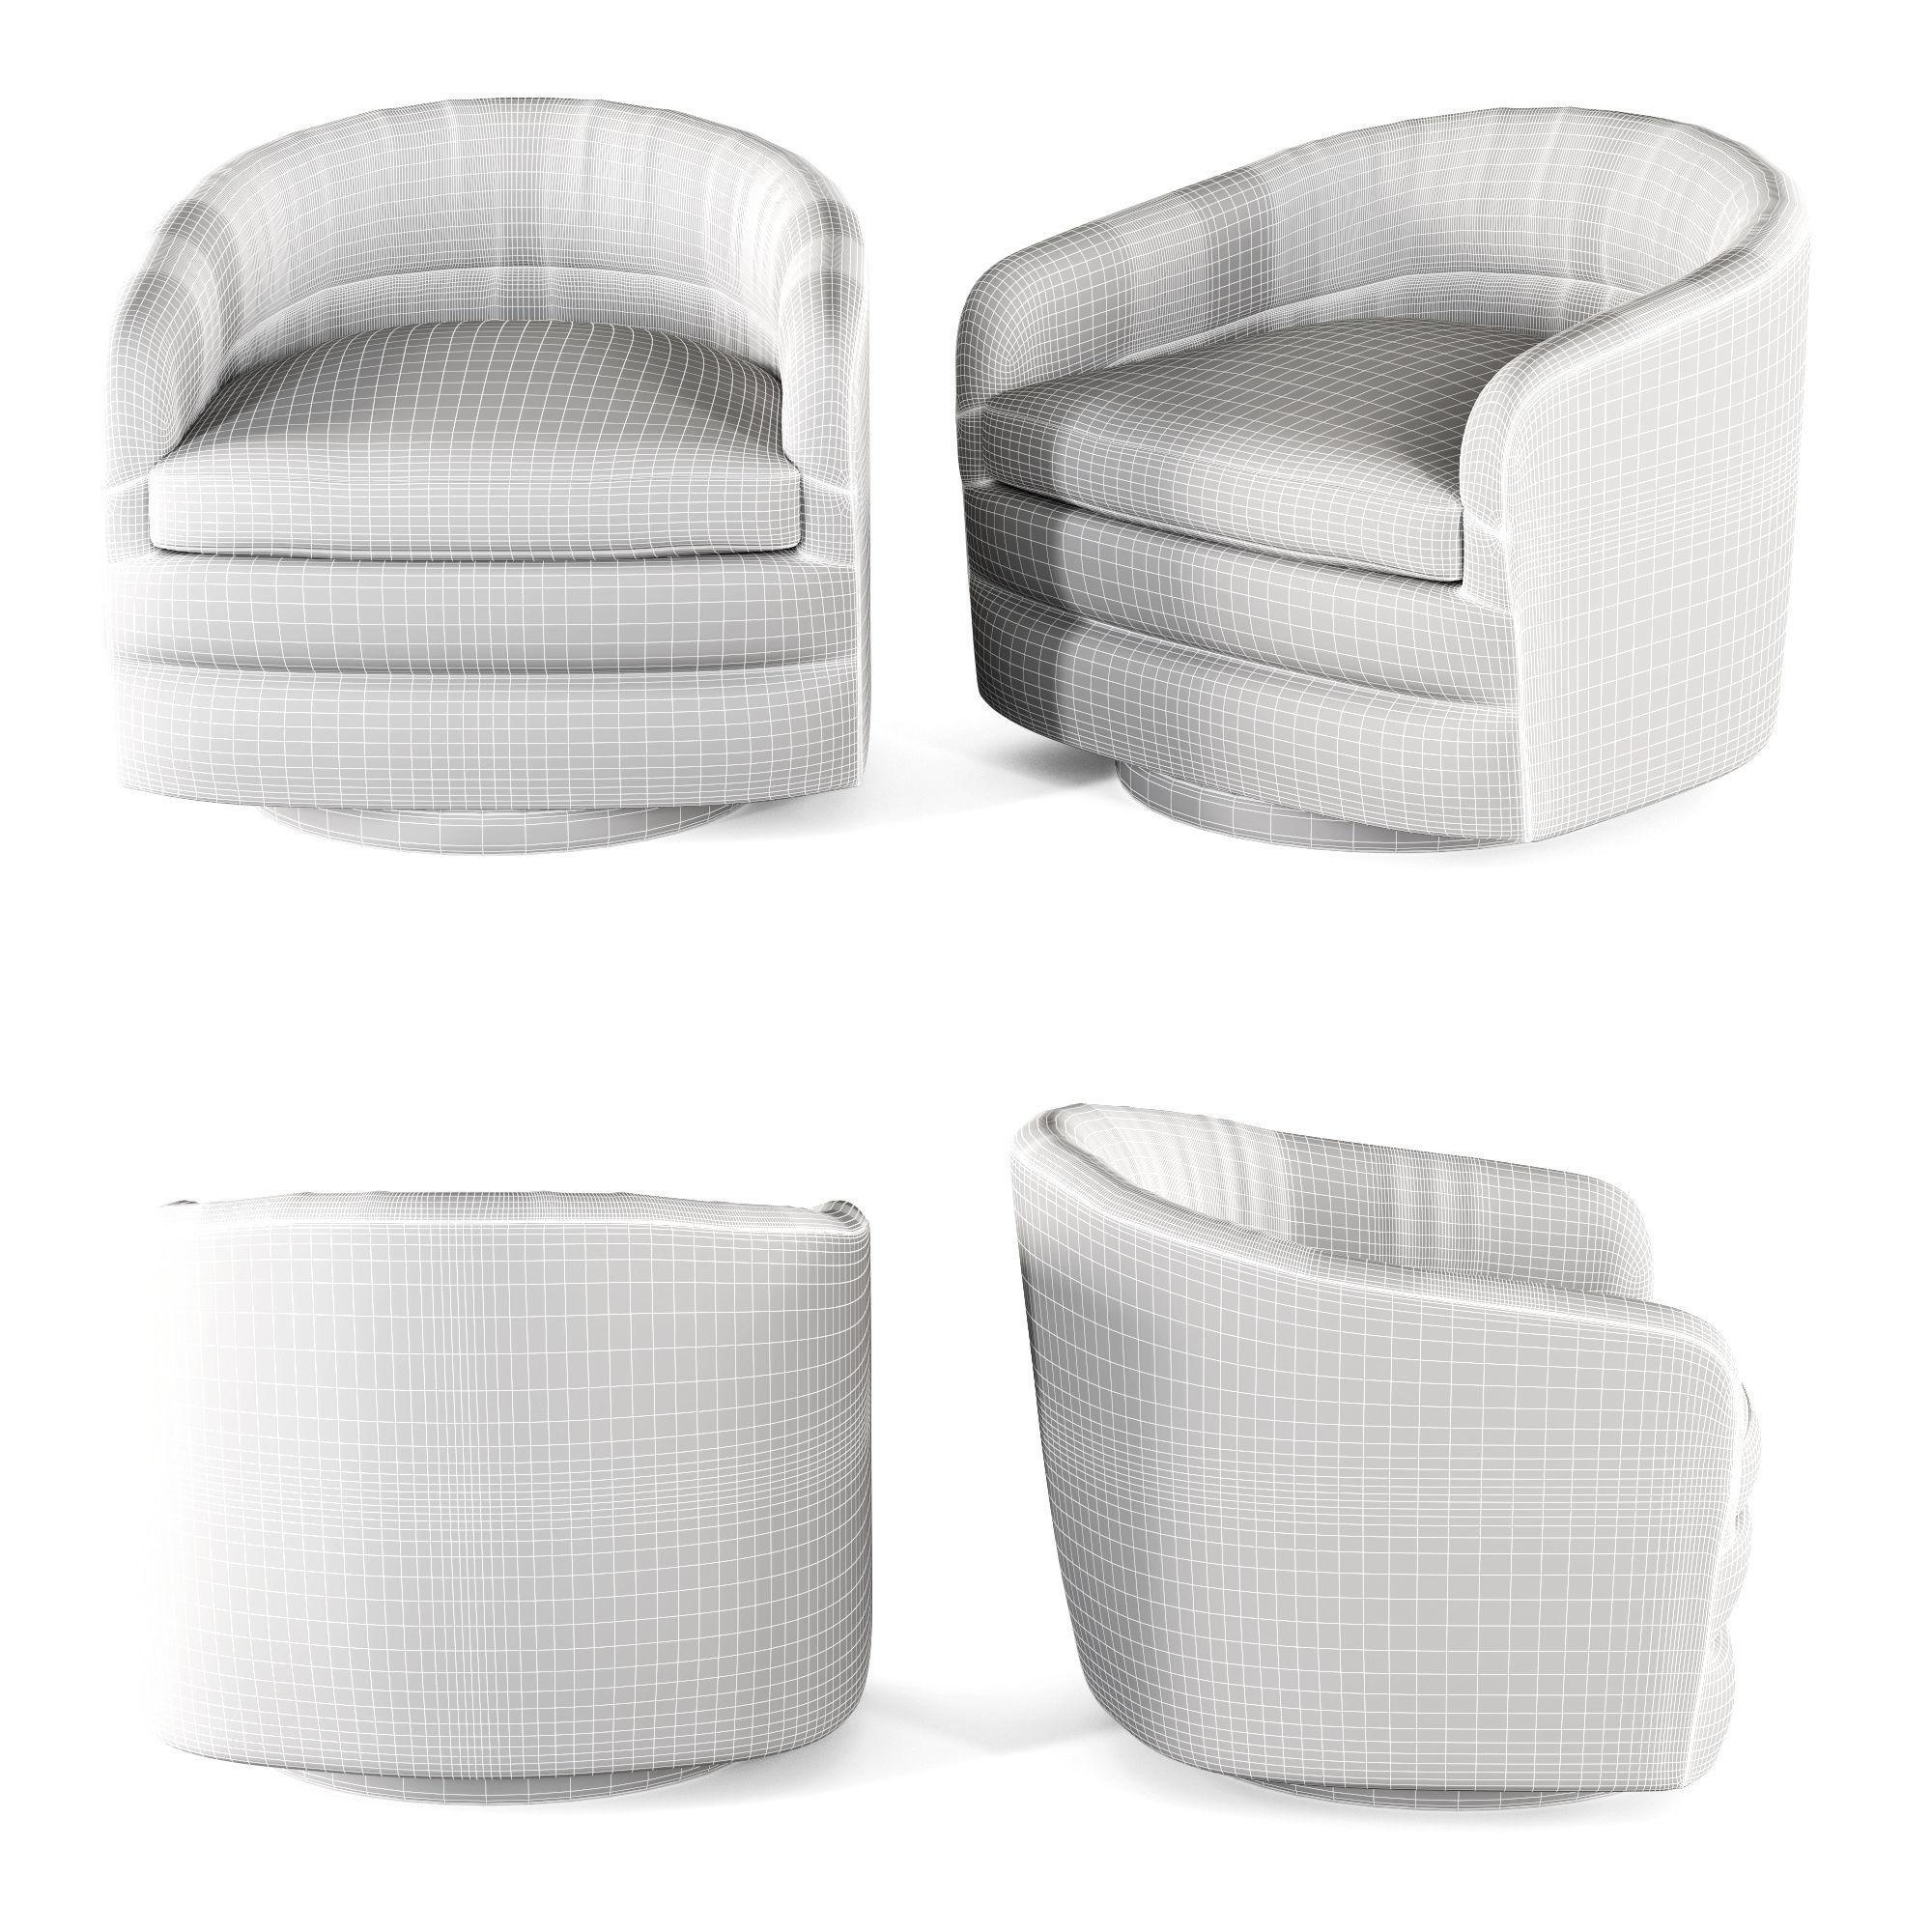 ... Milo Baughman Swivel Tub Chairs For Thayer Coggin 3d Model Max Obj Mtl 3